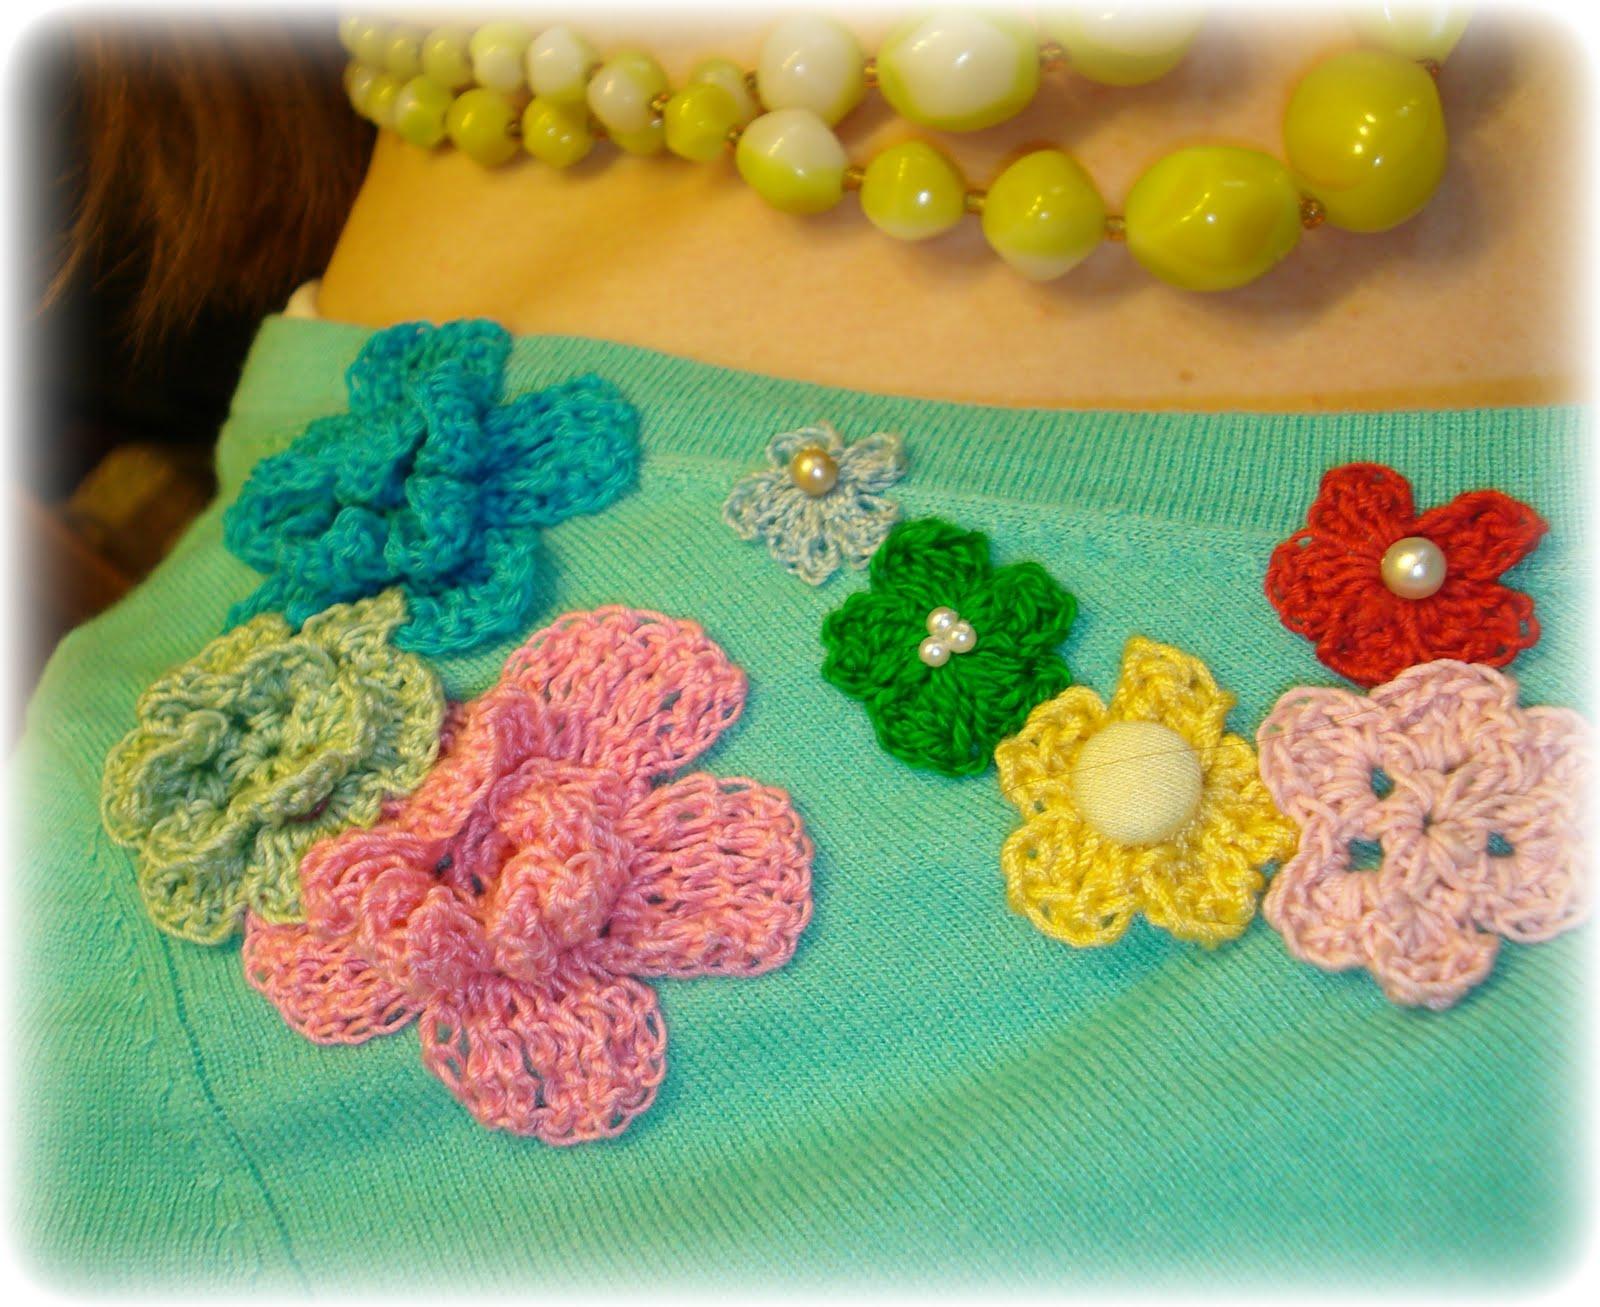 twobutterflies: The Flower Garden Cardigan